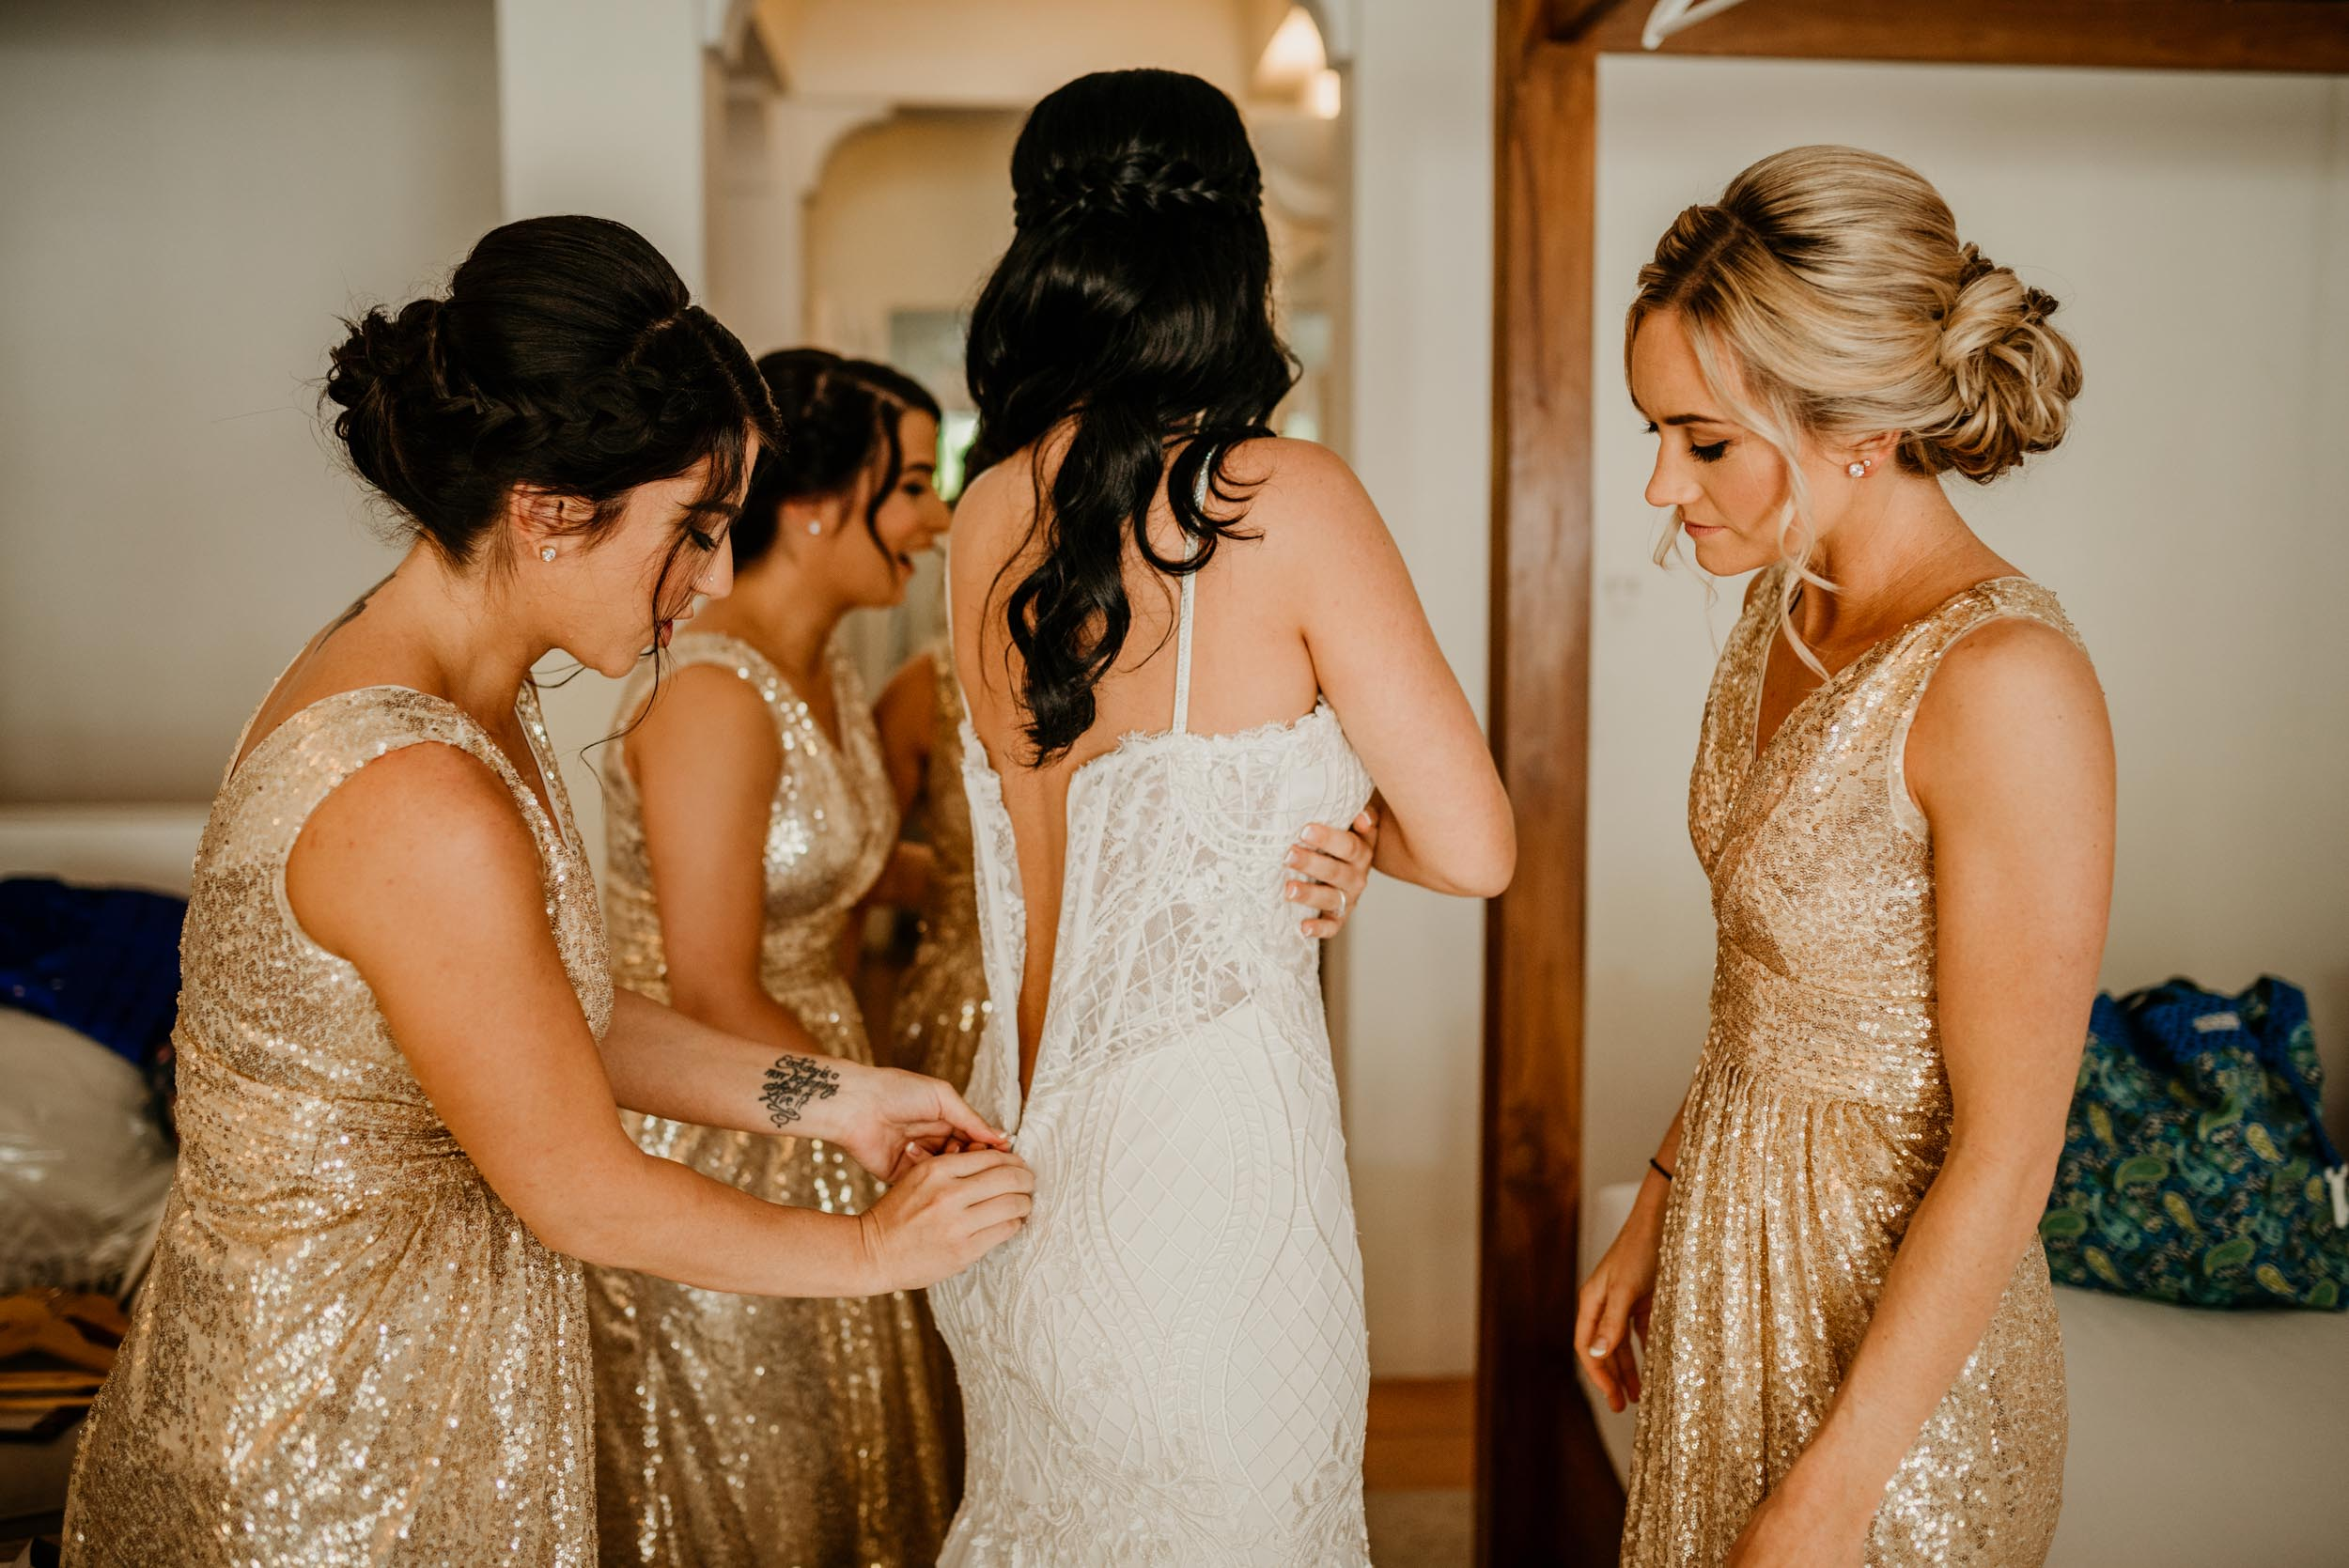 The Raw Photographer - Cairns Wedding Photographer - Beach Palm Cove Ceremony - Dress Irene Costa's Devine Bridal - Queensland-20.jpg